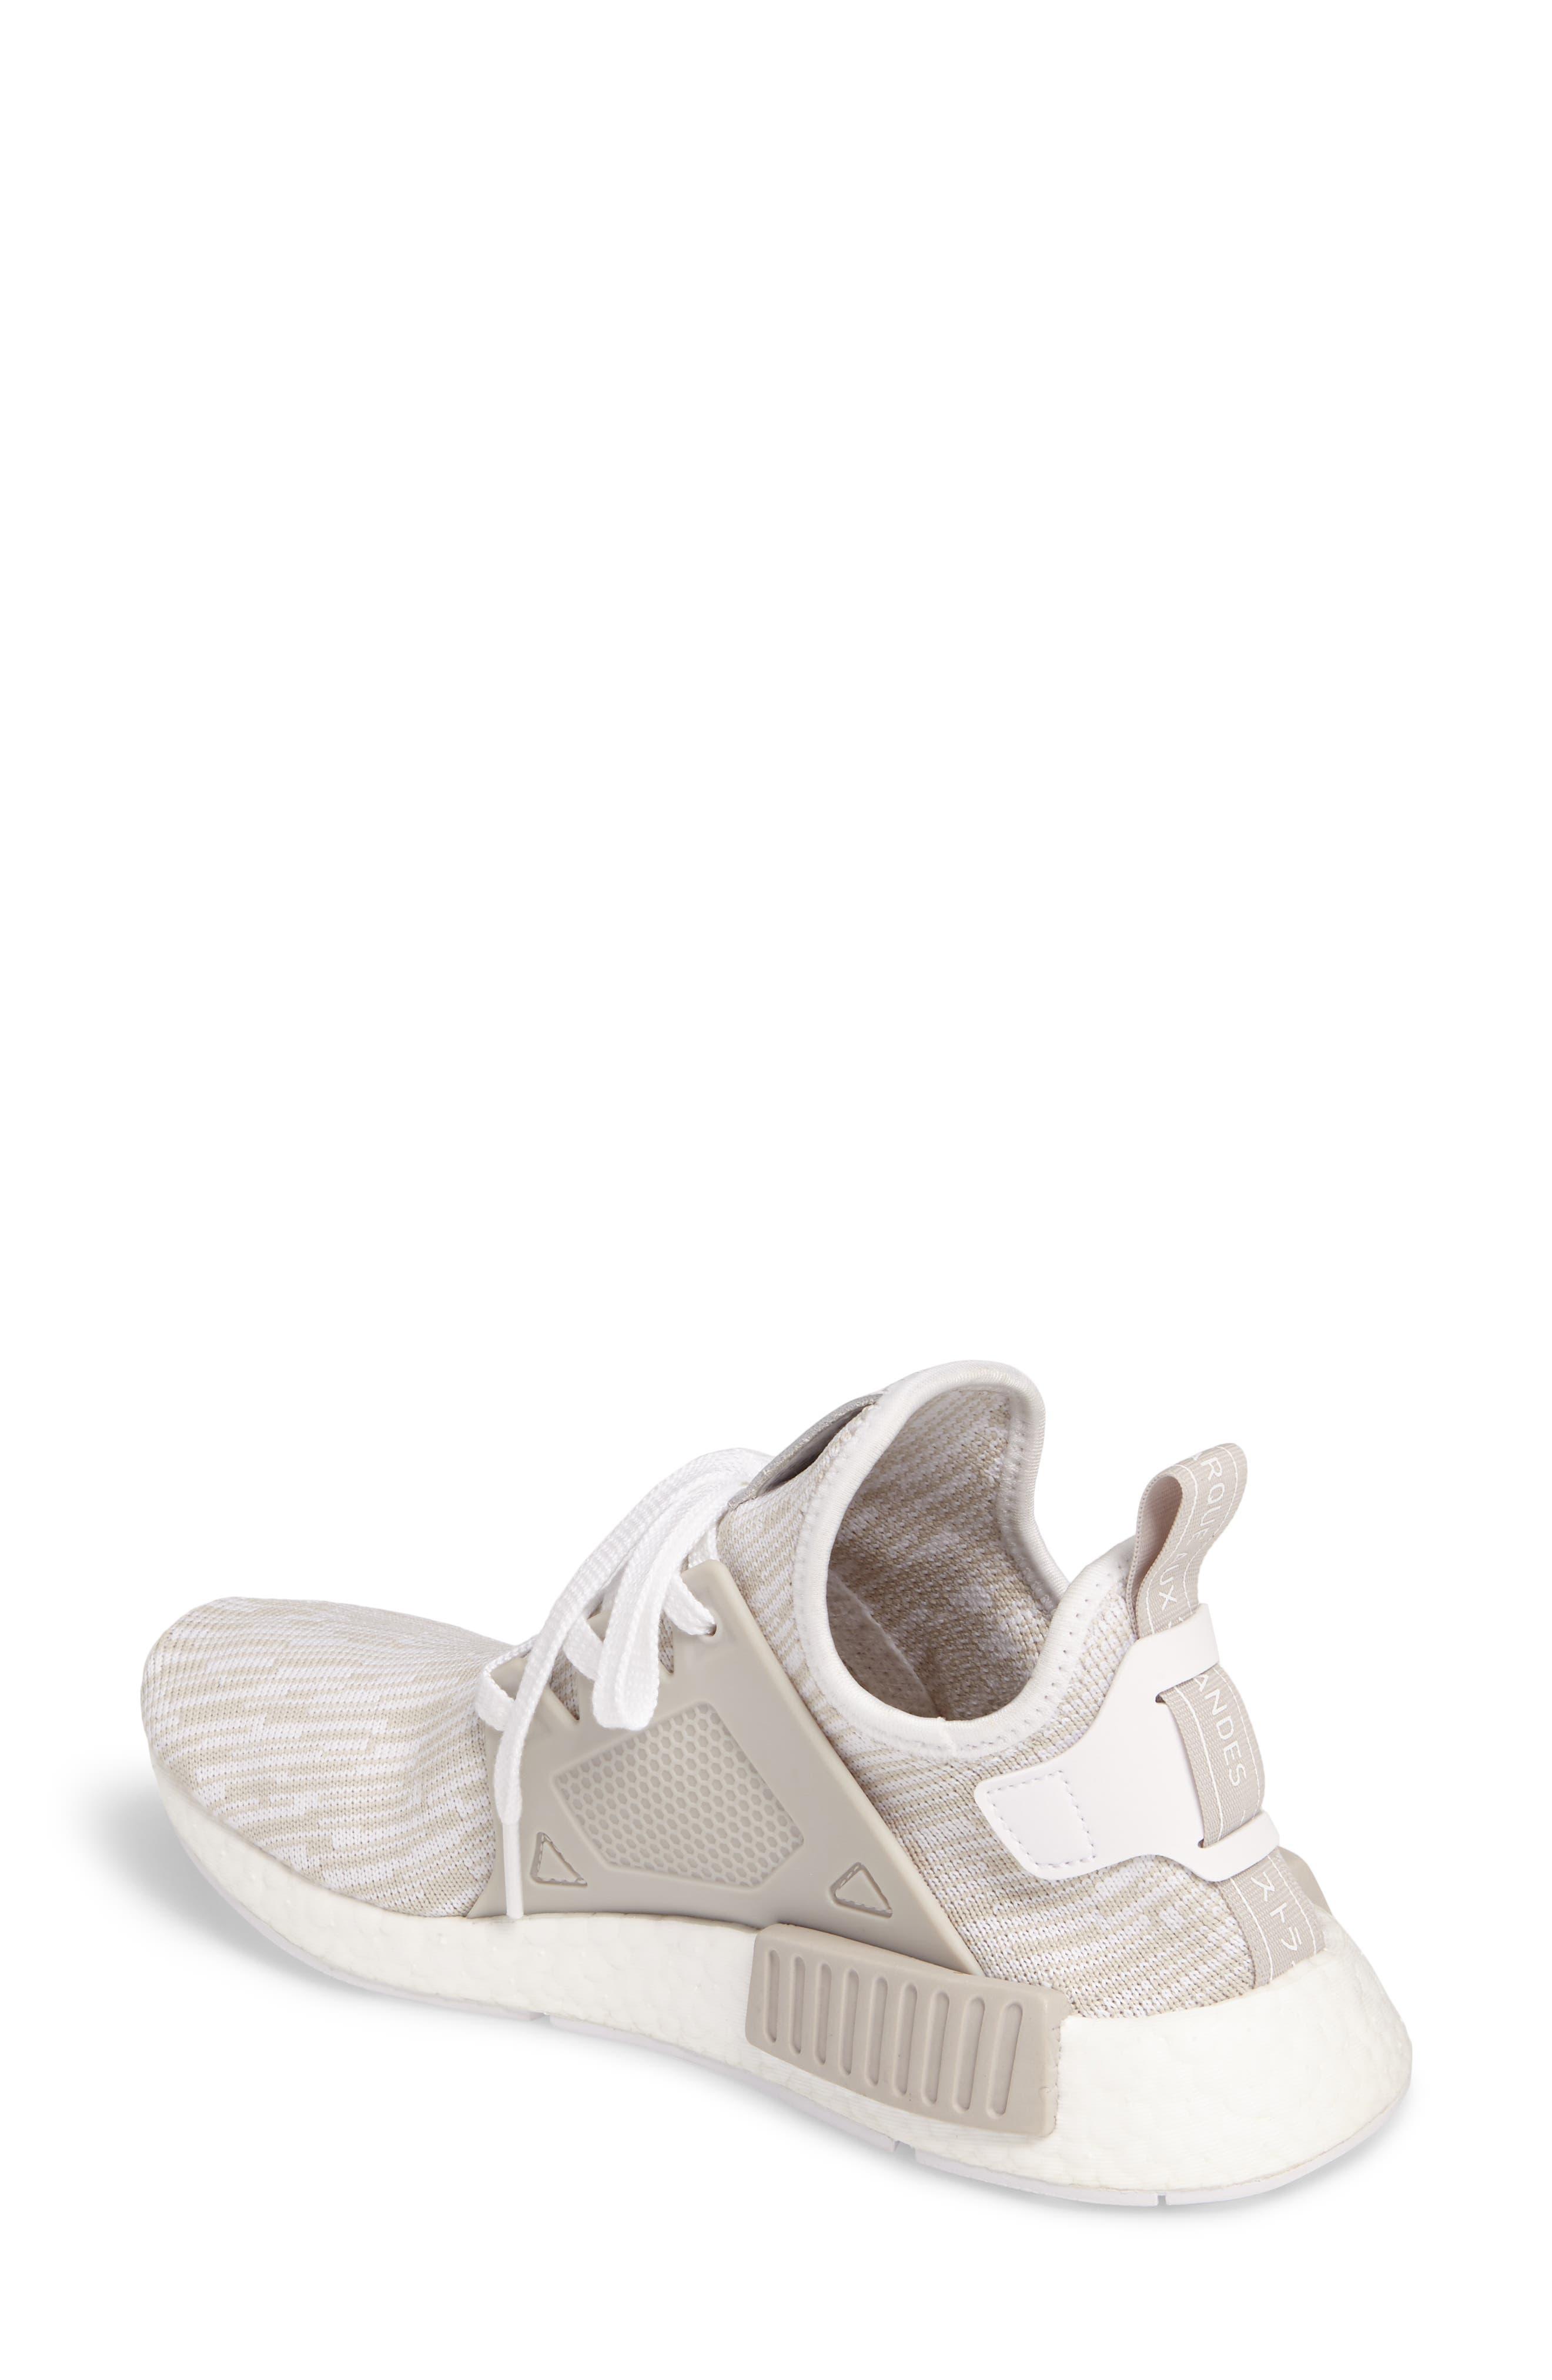 Alternate Image 2  - adidas NMD XR1 Athletic Shoe (Women)